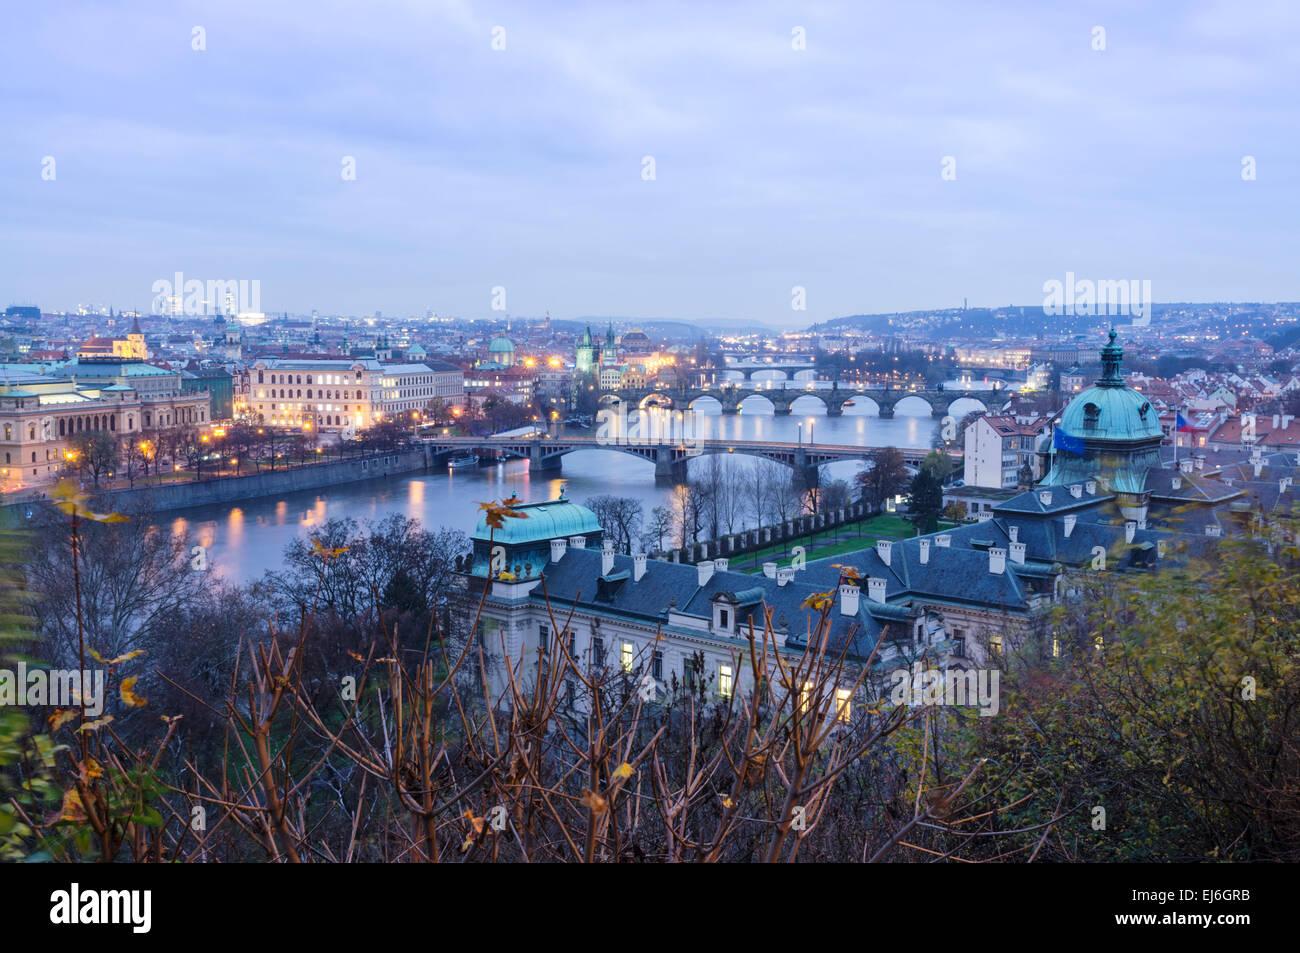 Bridges over the Vltava river, as seen from Letná at dusk. Prague, Czech Republic - Stock Image